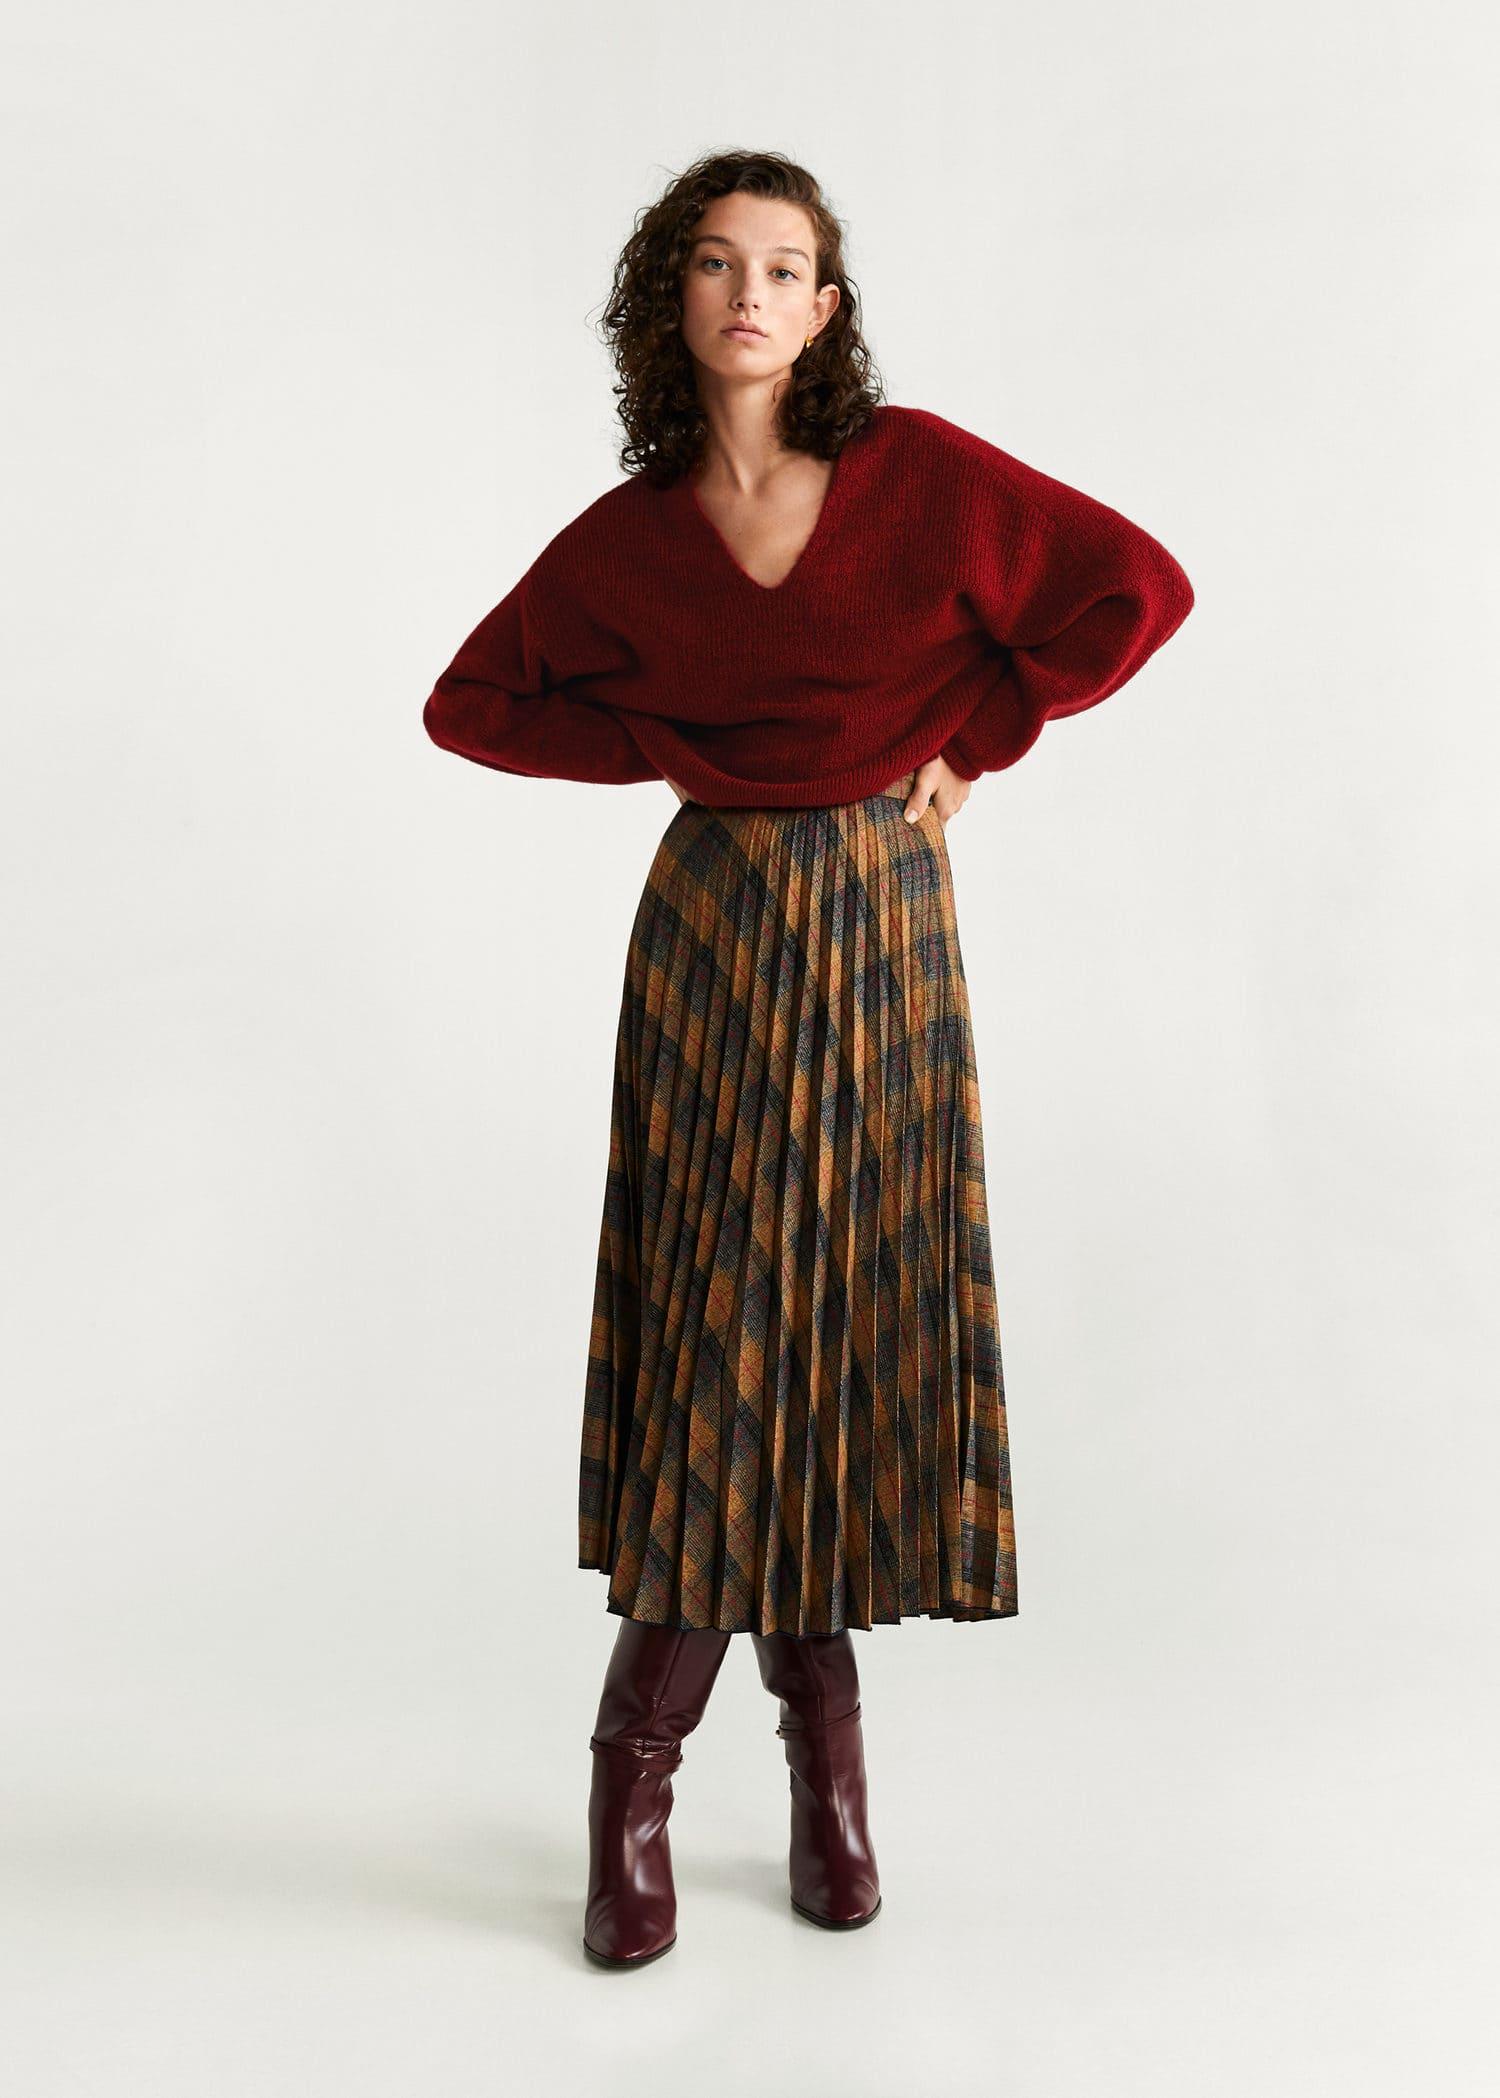 bajo precio 358fe 330bb Cardigans and sweaters for Women 2019 | Mango United Kingdom